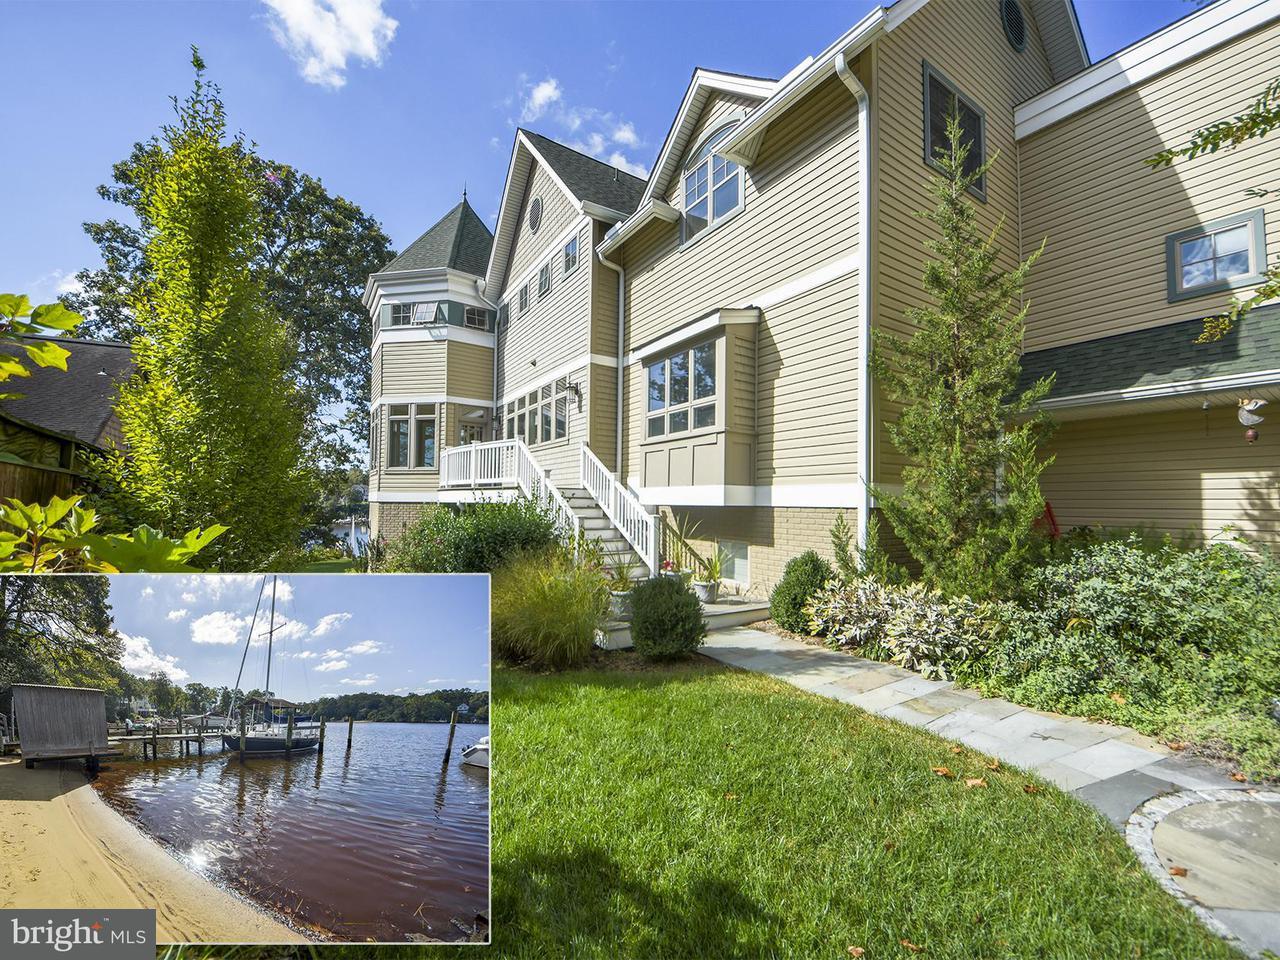 Single Family Home for Sale at 641 HONEYSUCKLE Lane 641 HONEYSUCKLE Lane Severna Park, Maryland 21146 United States